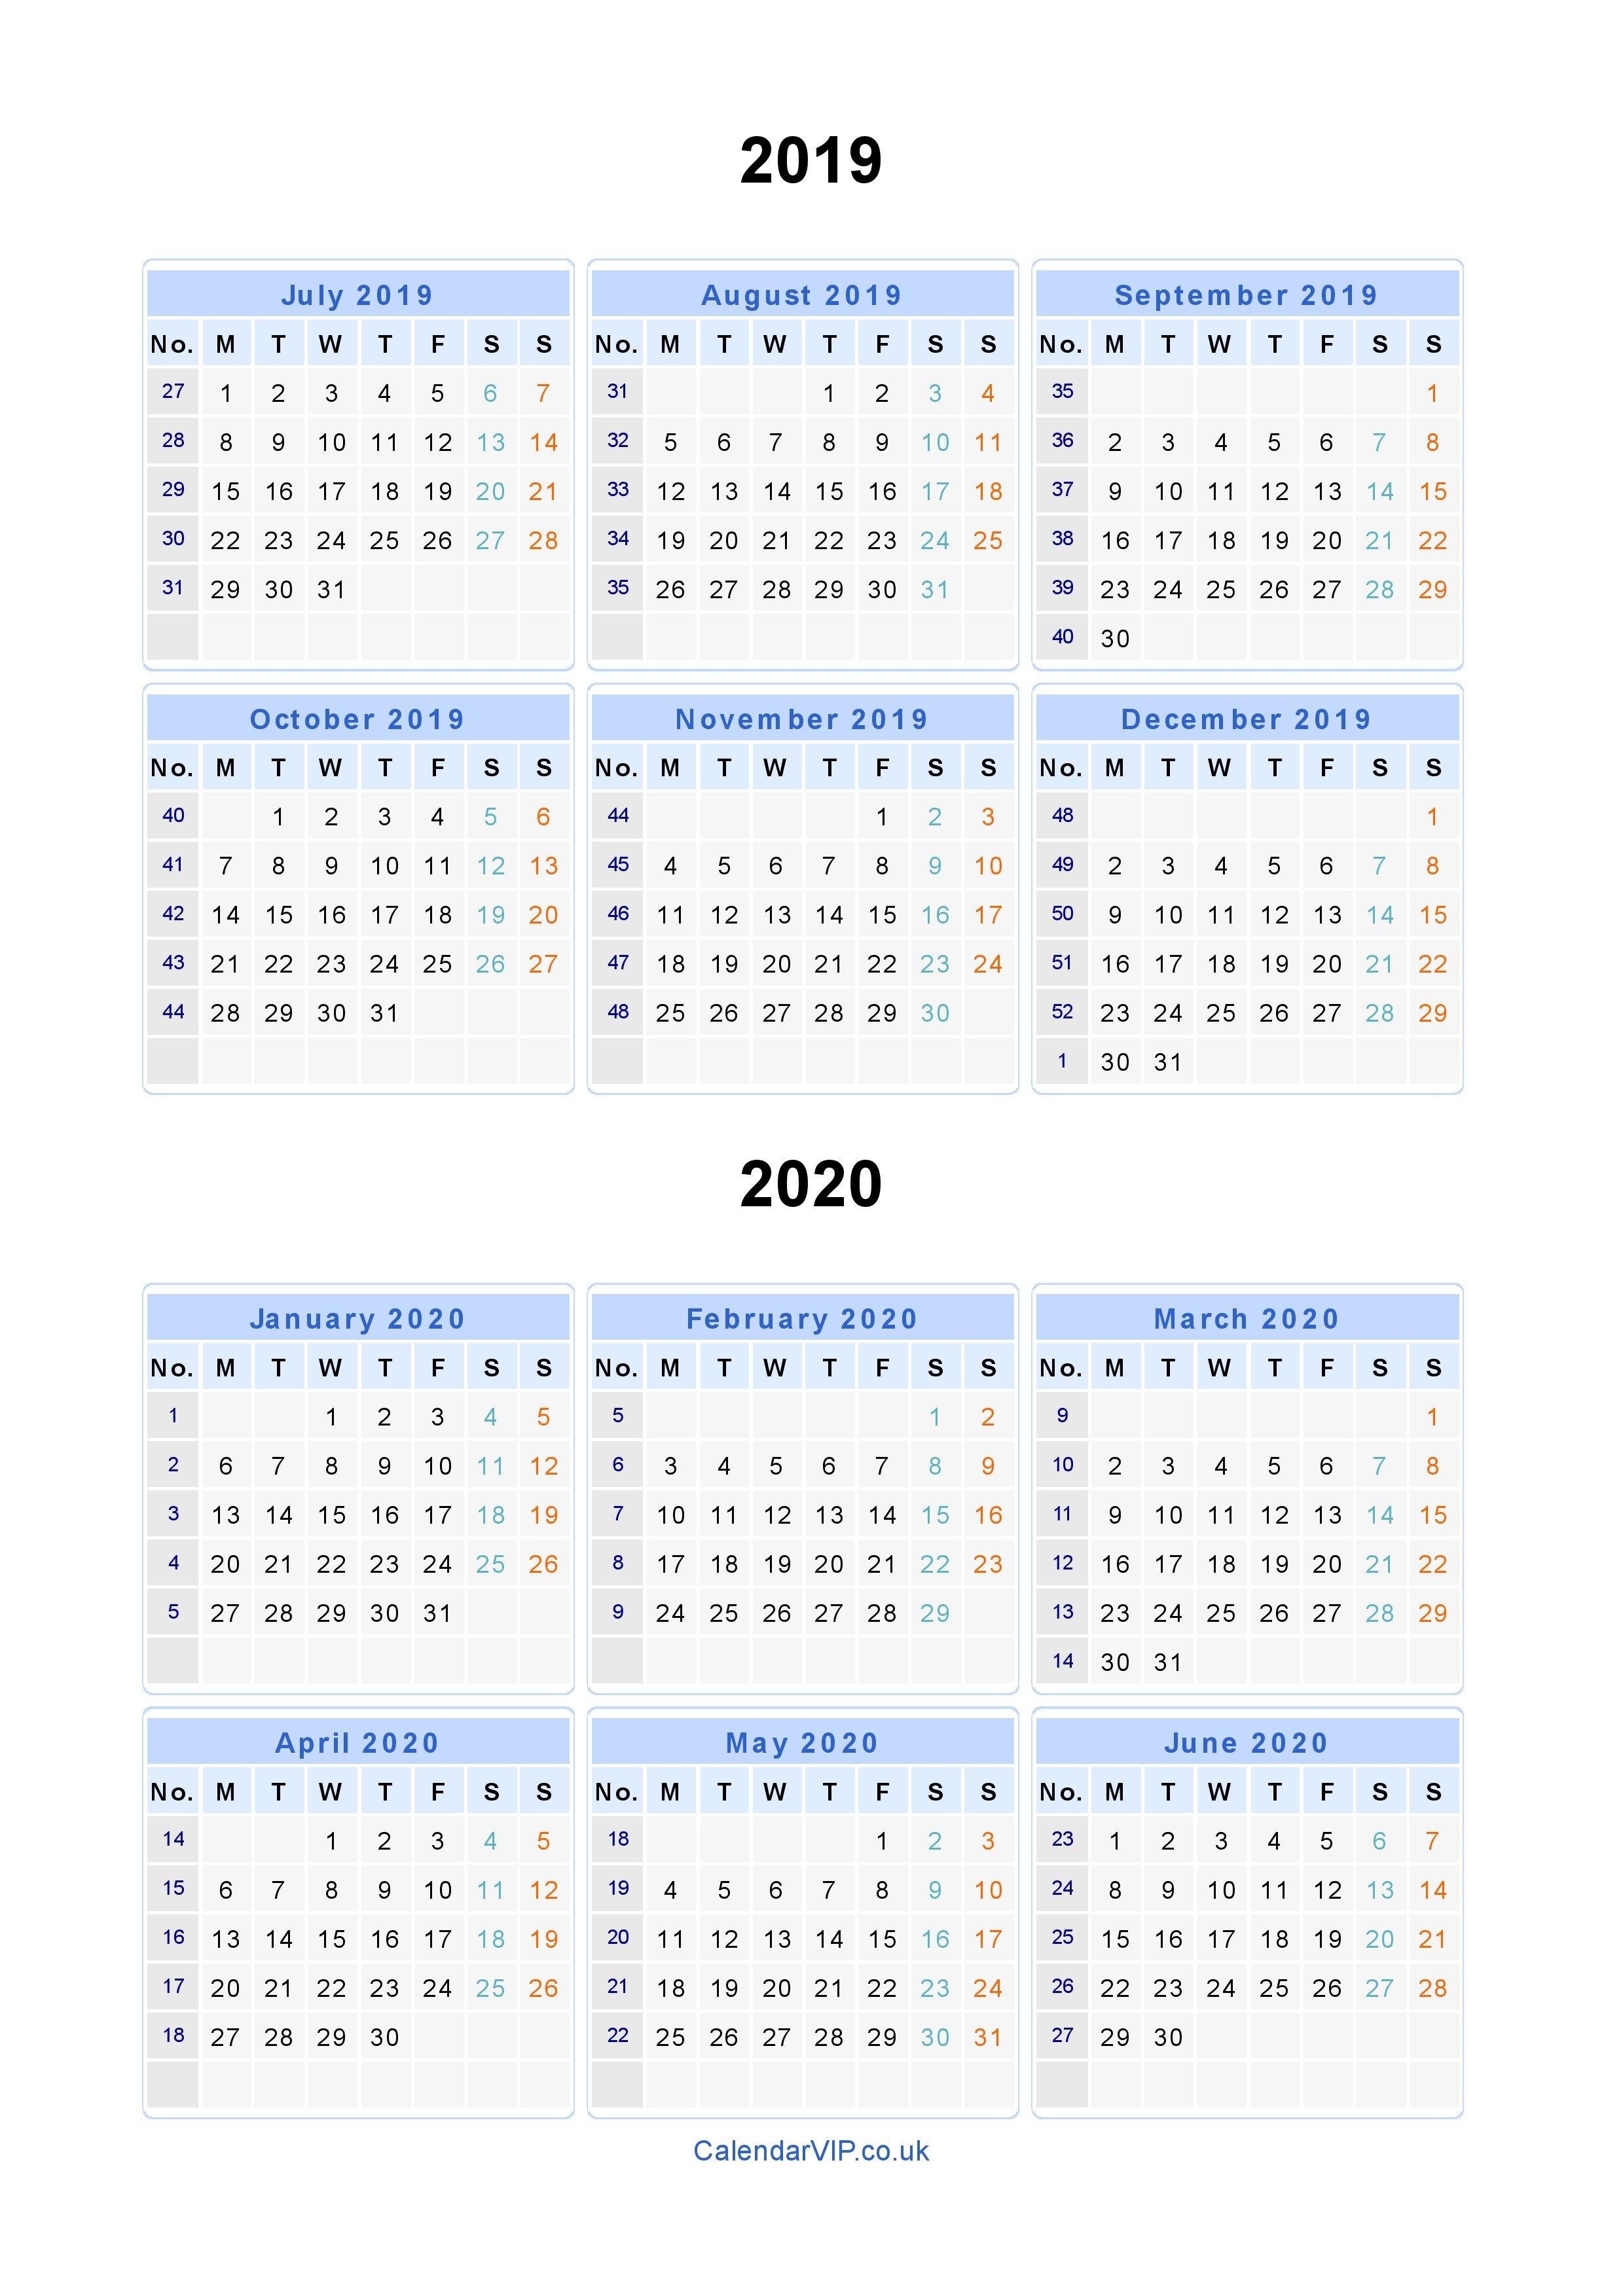 Split Year Calendars 2019 2020 – Calendar From July 2019 To June 2020 Calendar 2019 To 2020